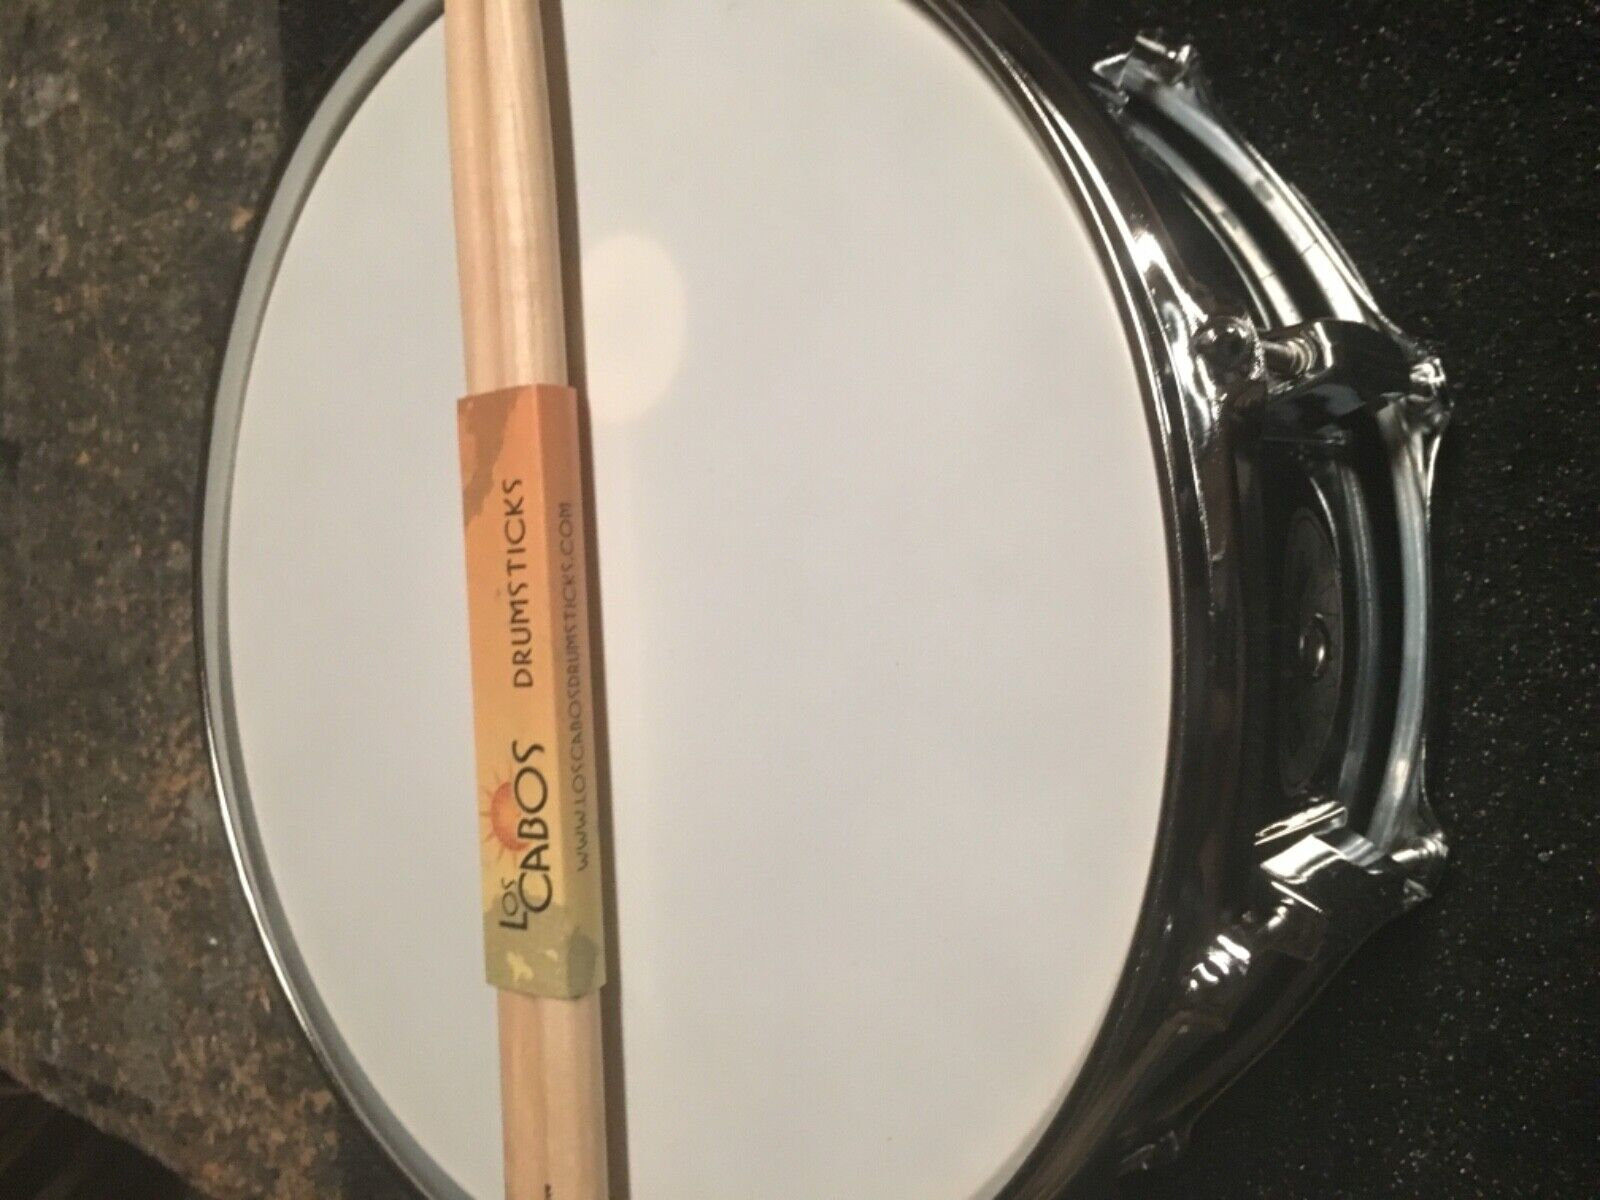 Savage chrome over steel snare drum - trevlig